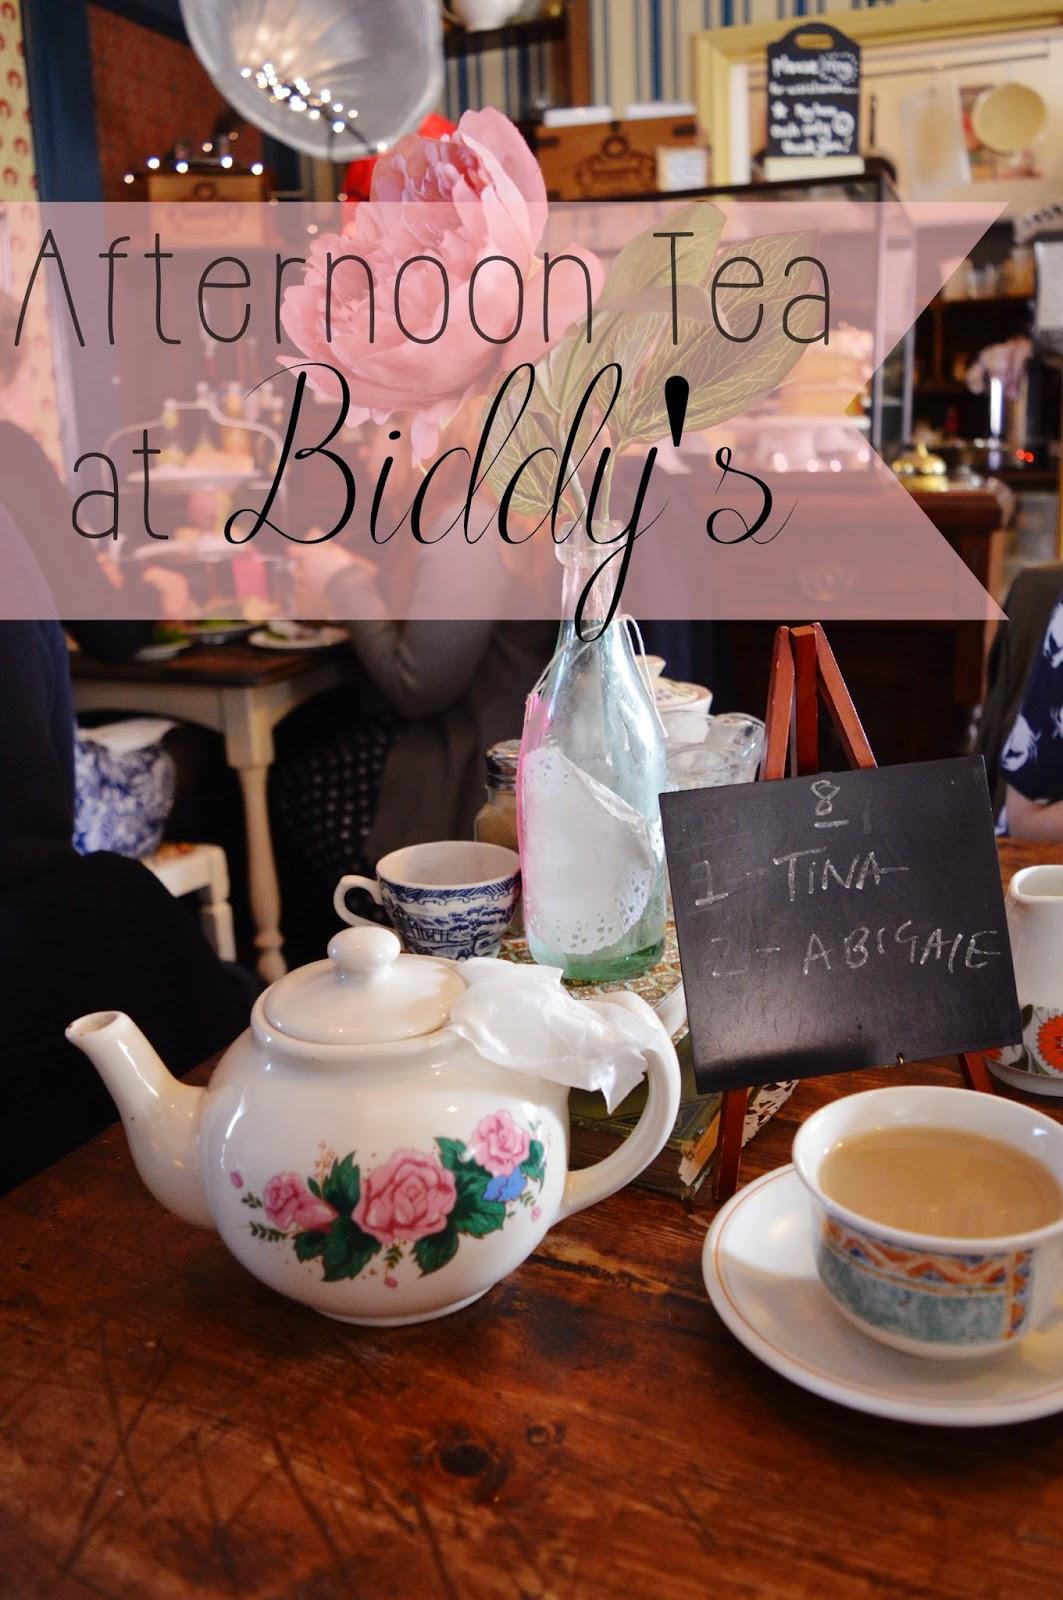 Abigail E Mann Archive Snug Afternoon Tea At Biddy S Tearoom